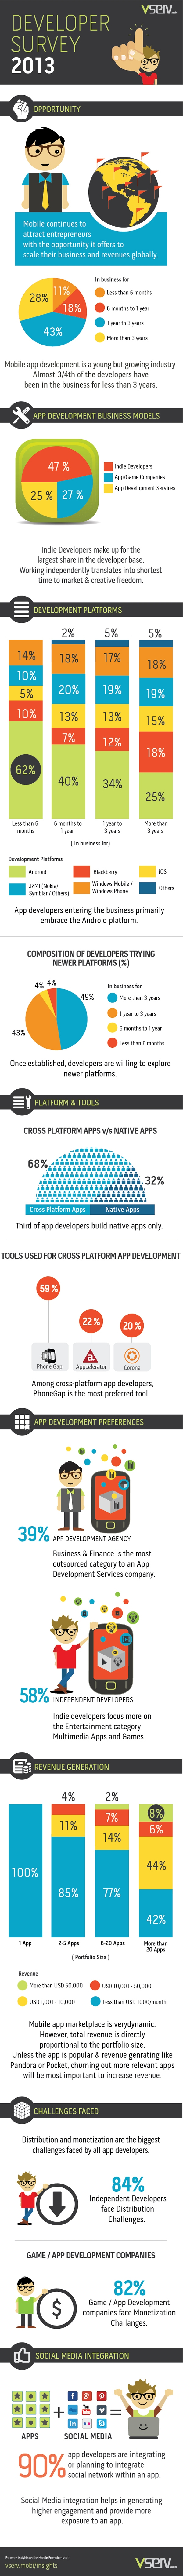 App Developer Survey Infographic